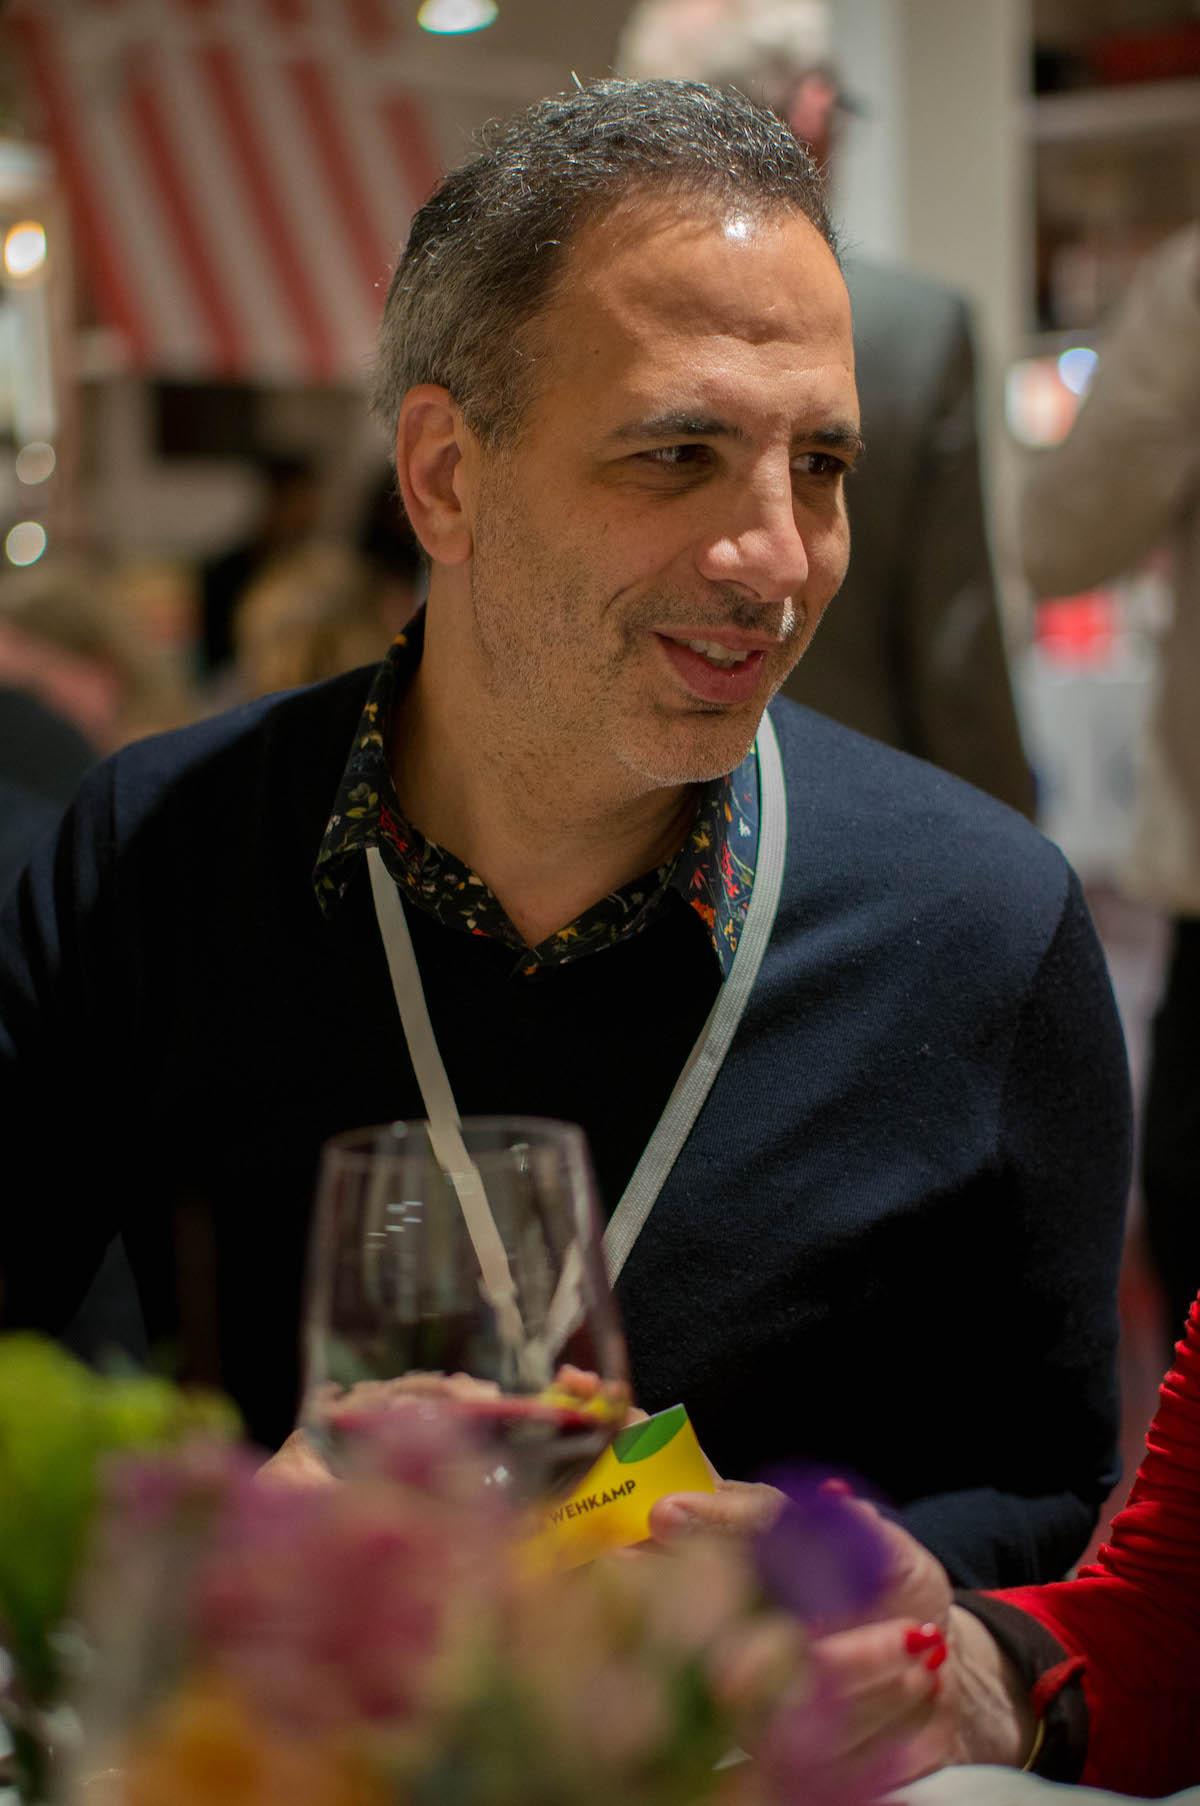 Yotam Ottolenghi in Amsterdam